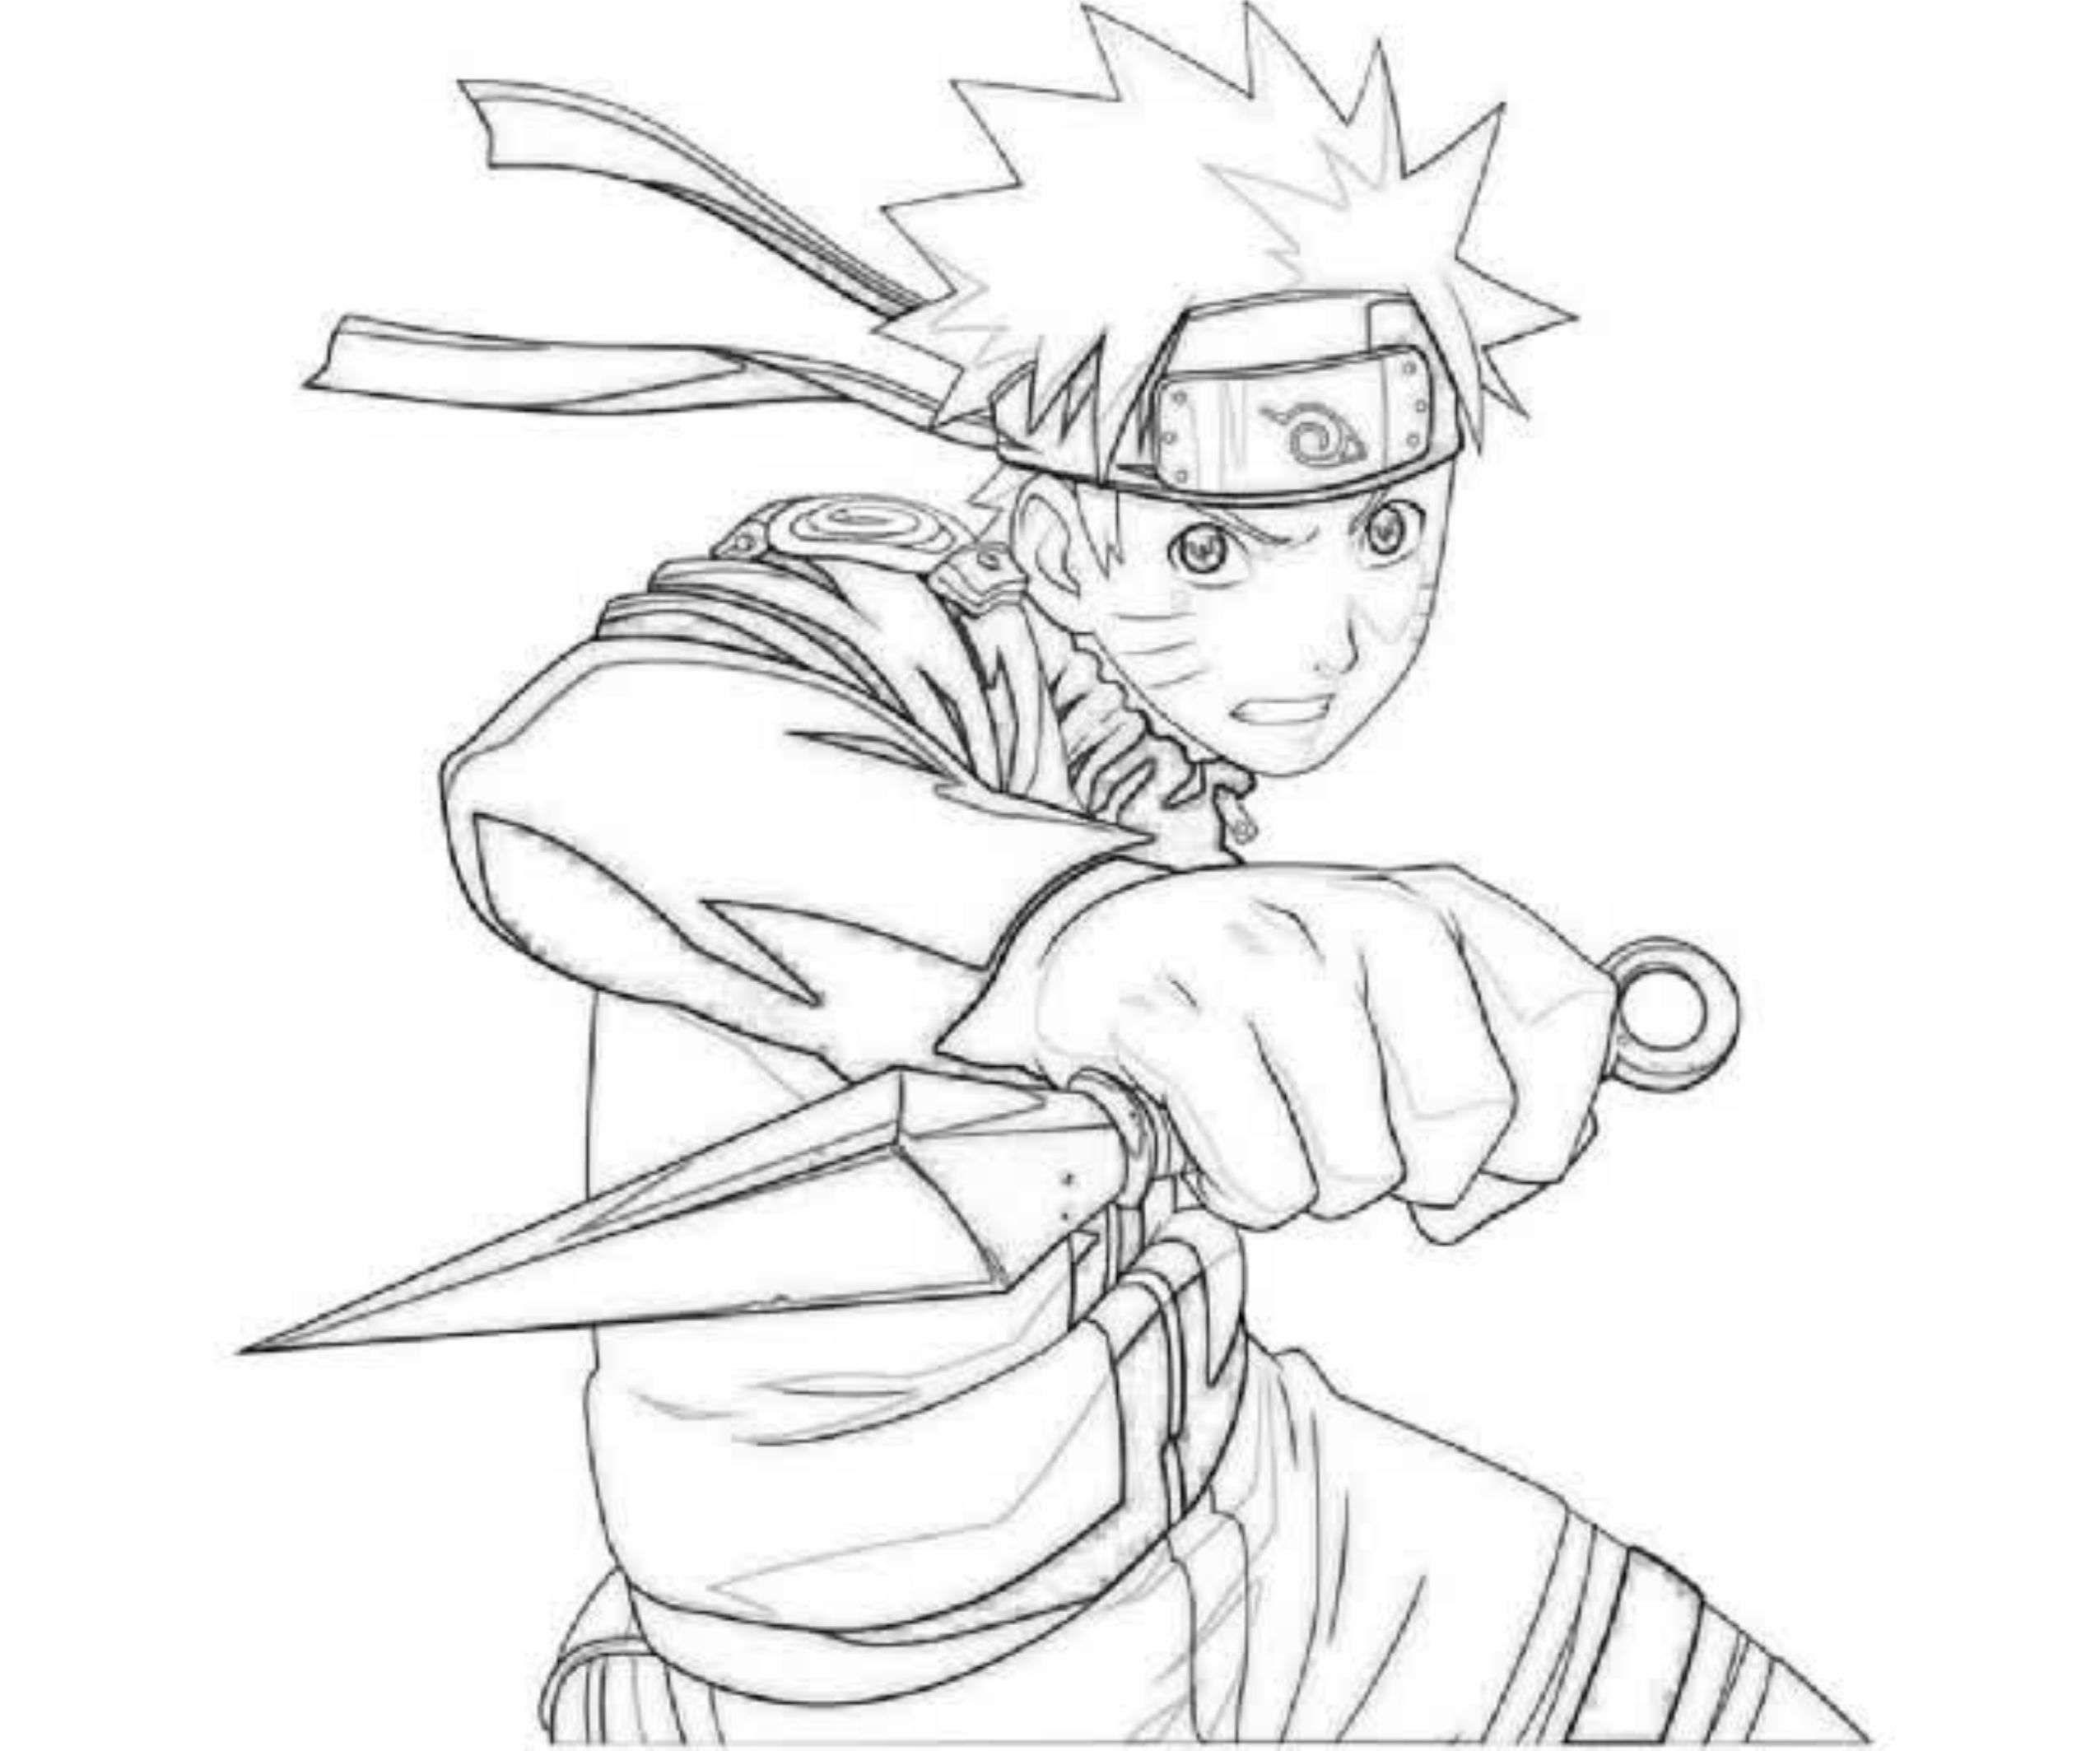 naruto coloring pages to print DRw Pinterest Naruto